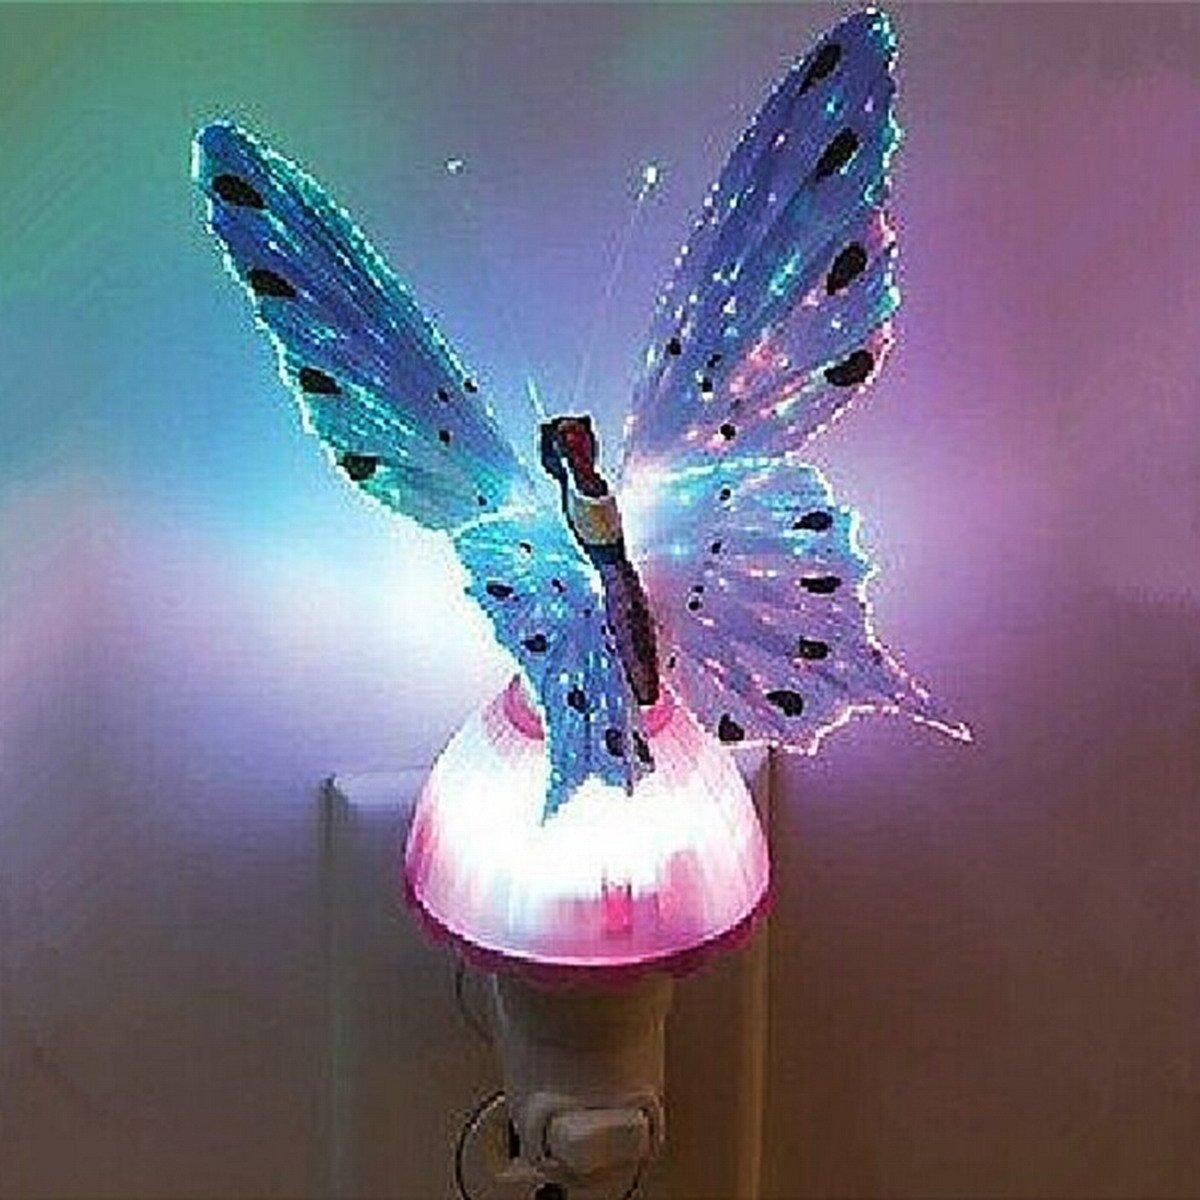 LED Night light,WONFAST Fiber Butterfly Kids Night light Plug type LED color changing night light for Bedroom, Living Room,Baby Room(Purple)